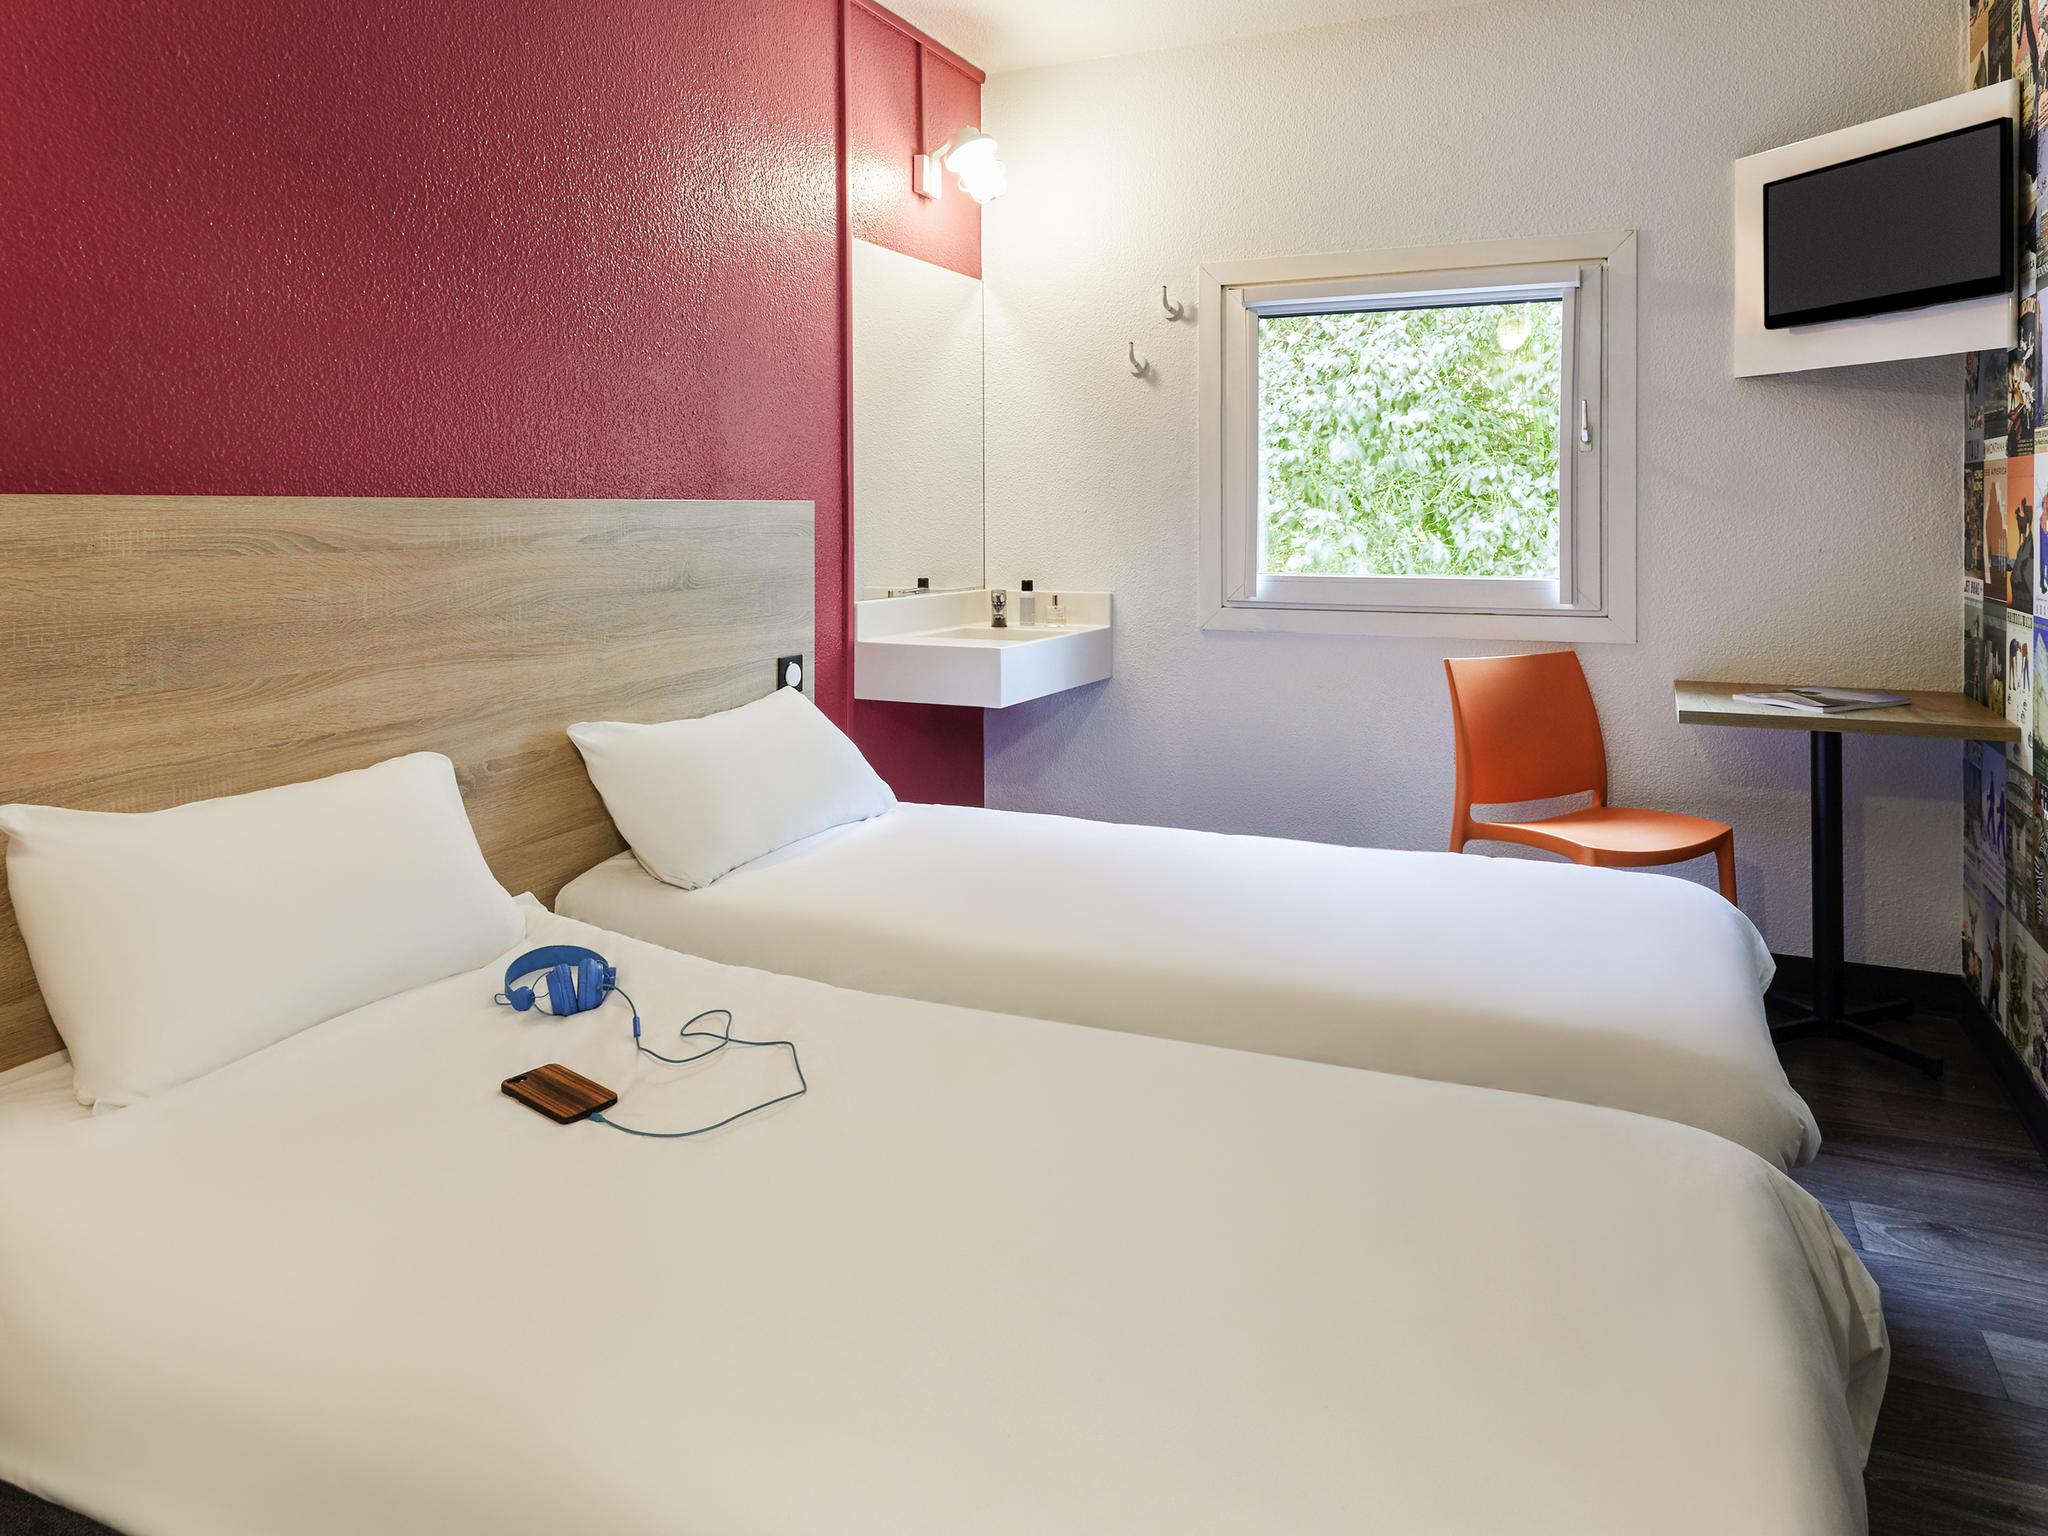 Отель — hotelF1 Saint-Étienne (rénové)